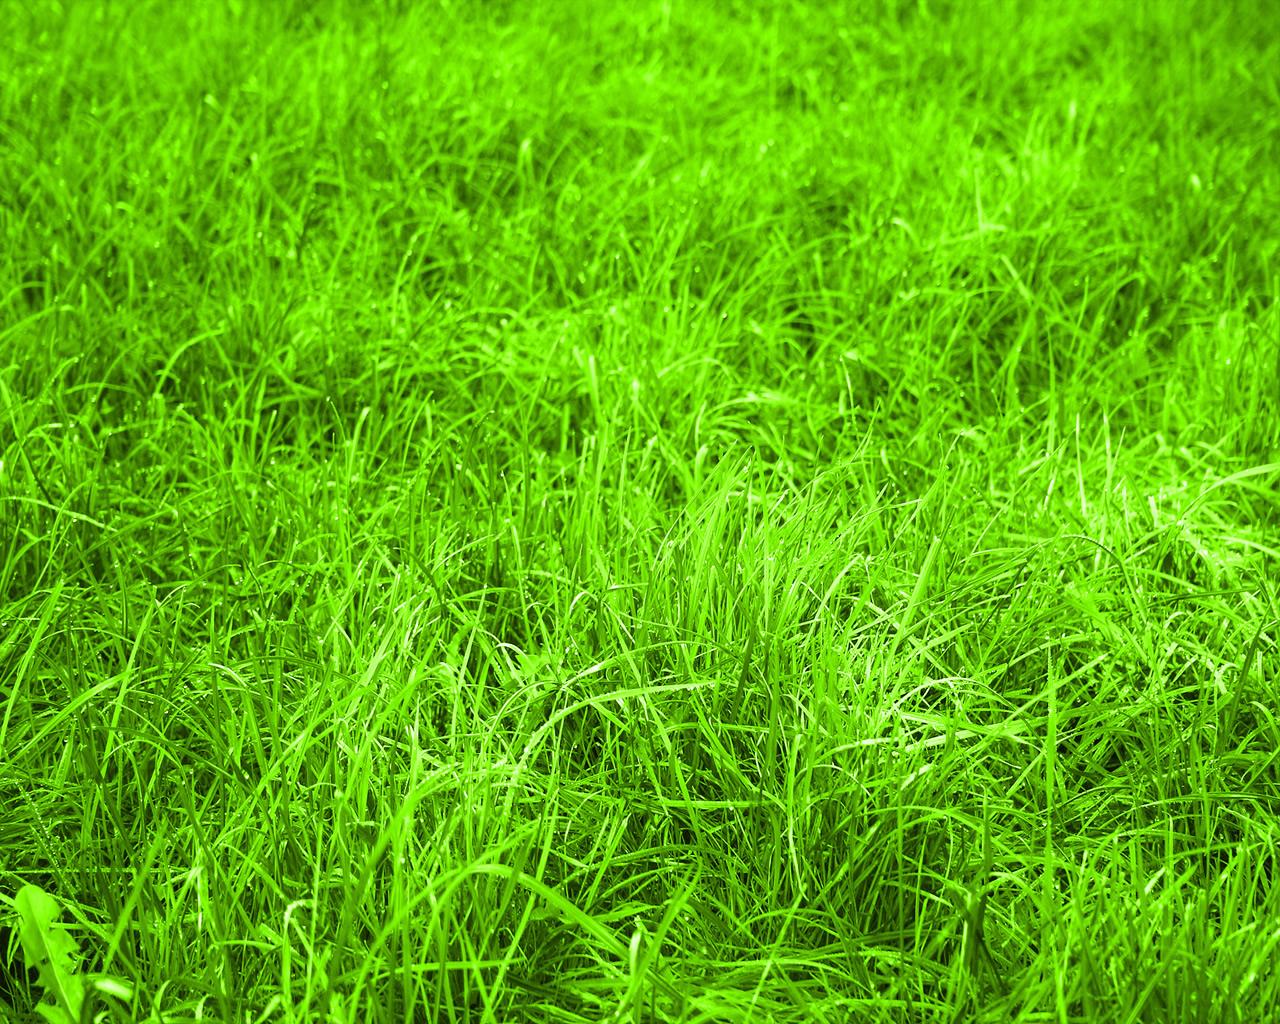 http://3.bp.blogspot.com/-mGZieQQlxFY/ThsWK5XEJjI/AAAAAAAAH5A/KqUrGDdOdFQ/s1600/nature+grass+wallpaper.jpg